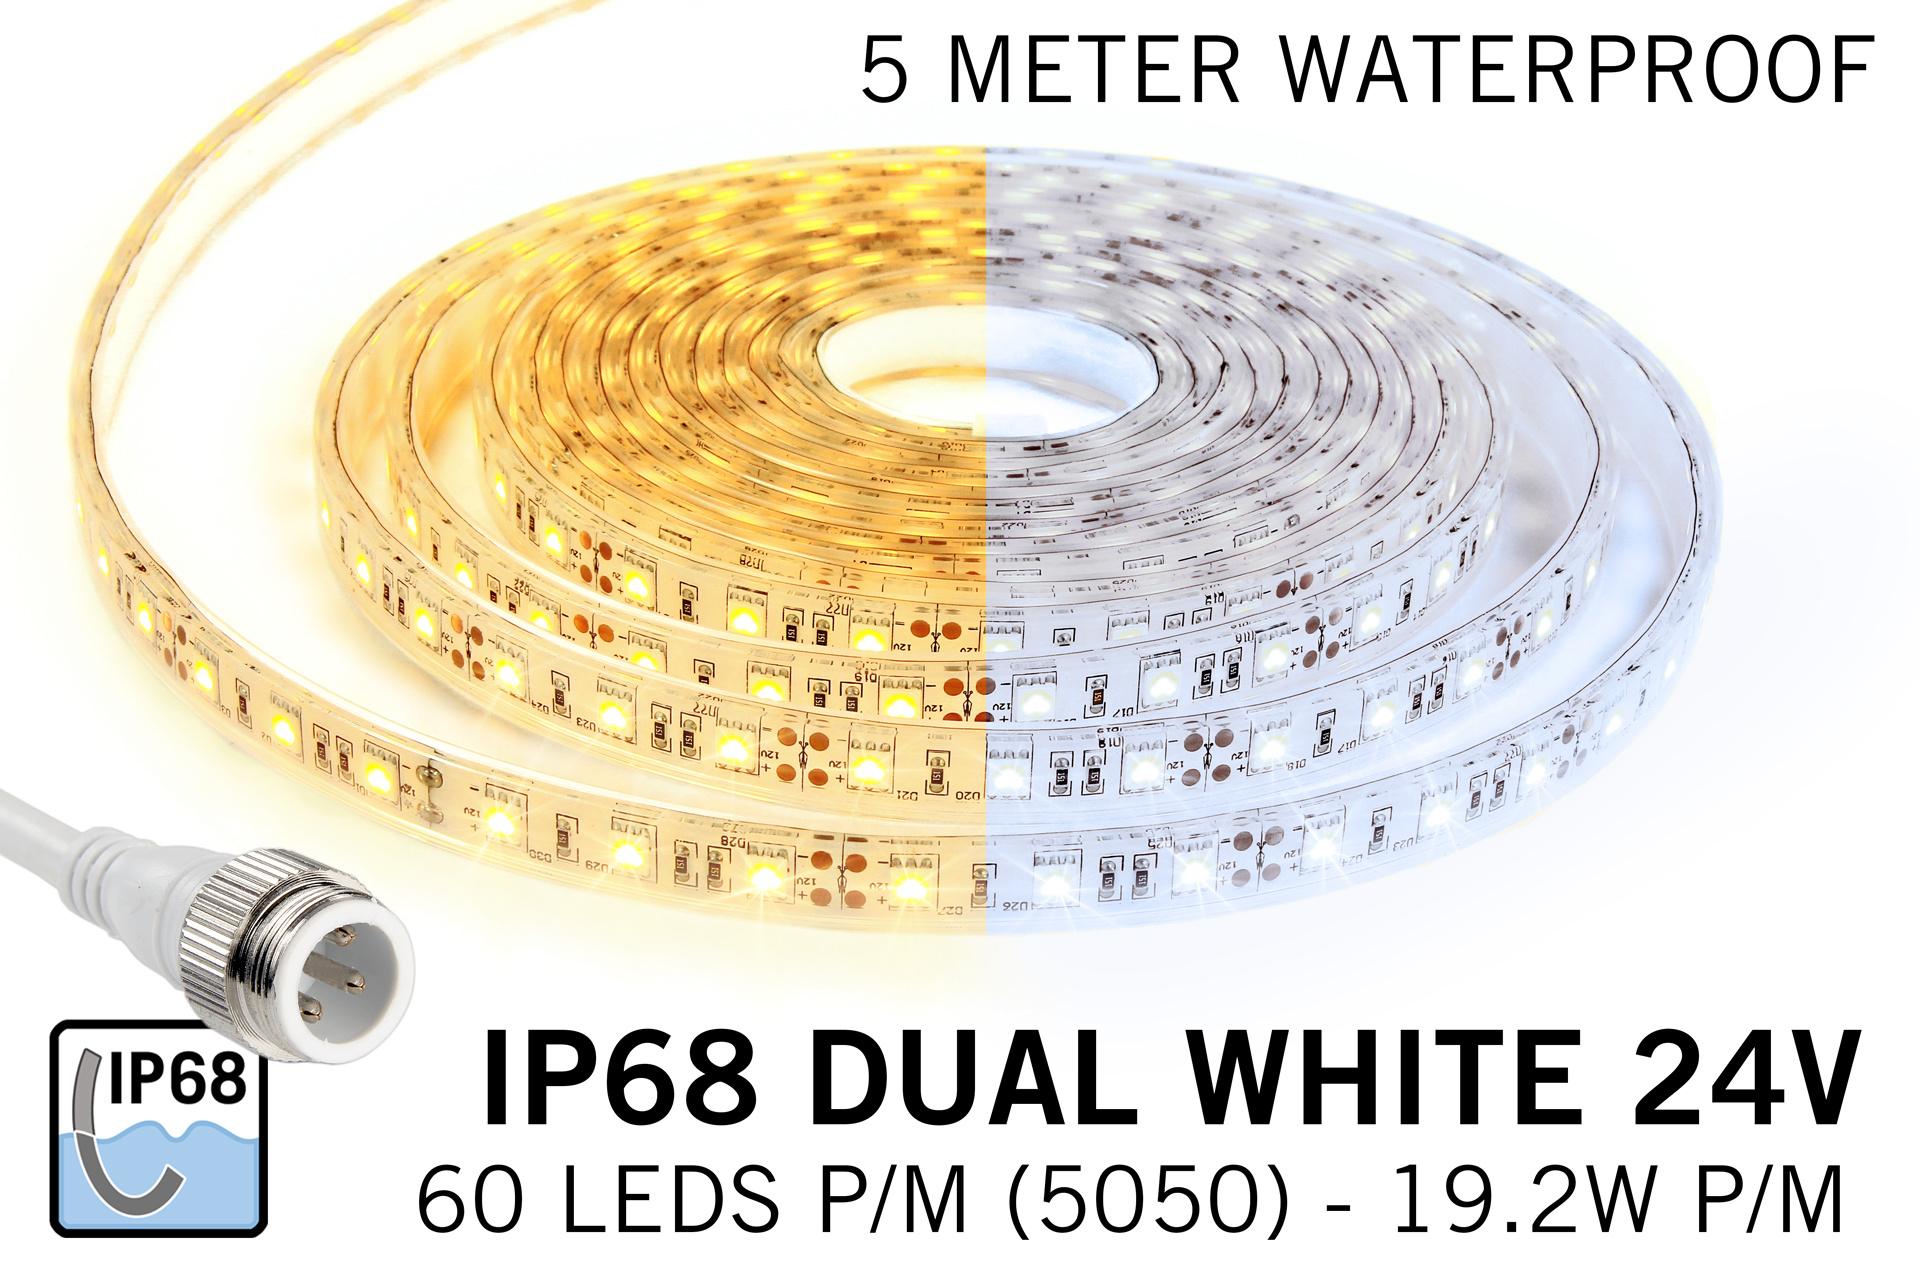 Dual White IP68 Waterdicht Led Strip | 5m 60 Leds pm Type 5050 24V Losse Strip